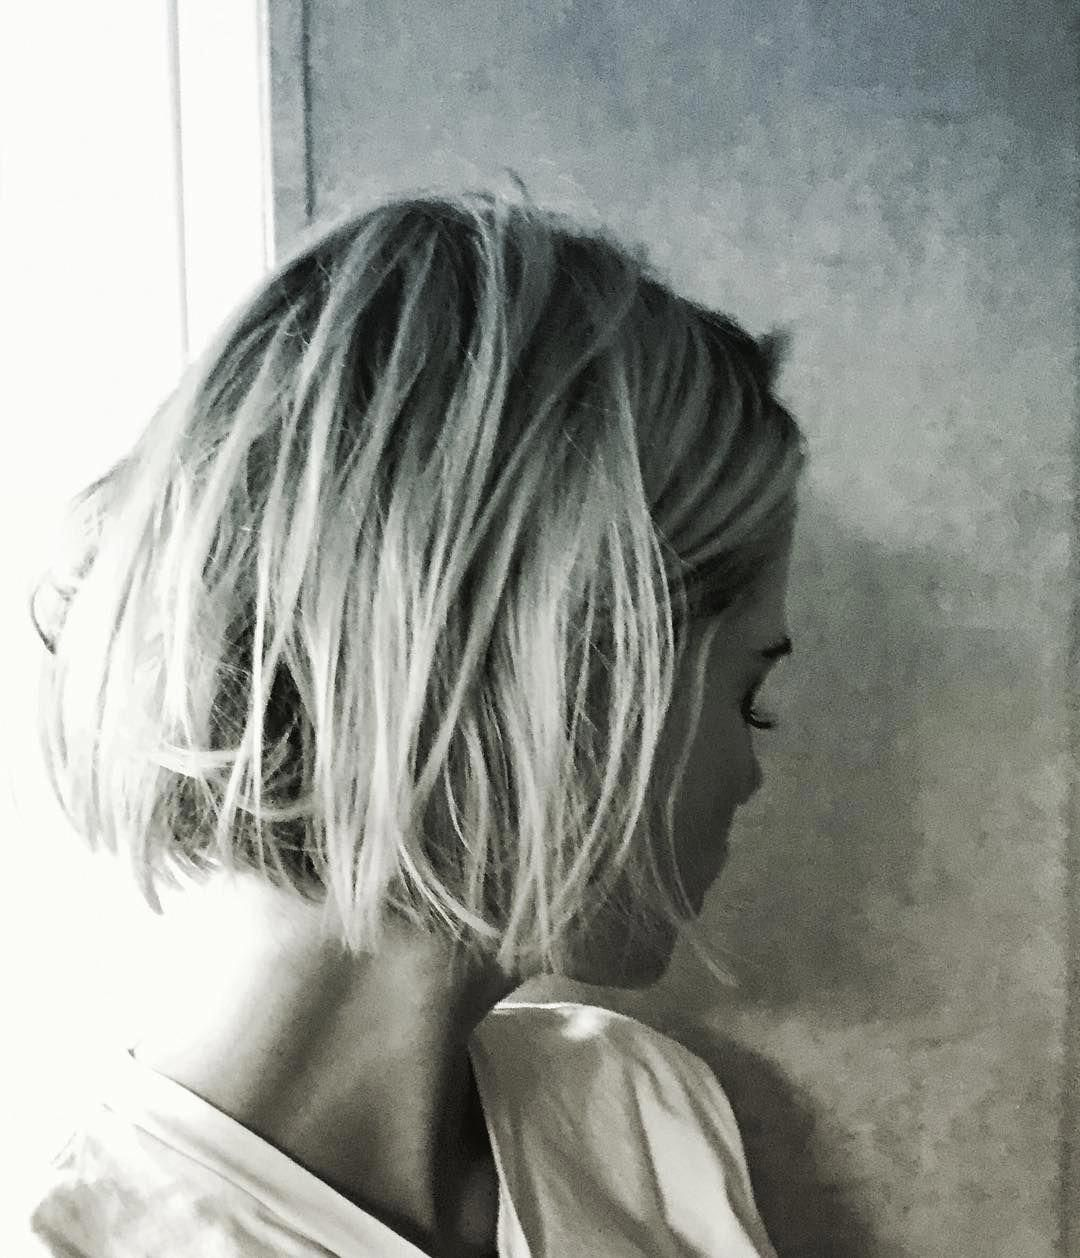 Trendfrisur: Alle tragen jetzt den Petit Bob  ELLE  Haar styling